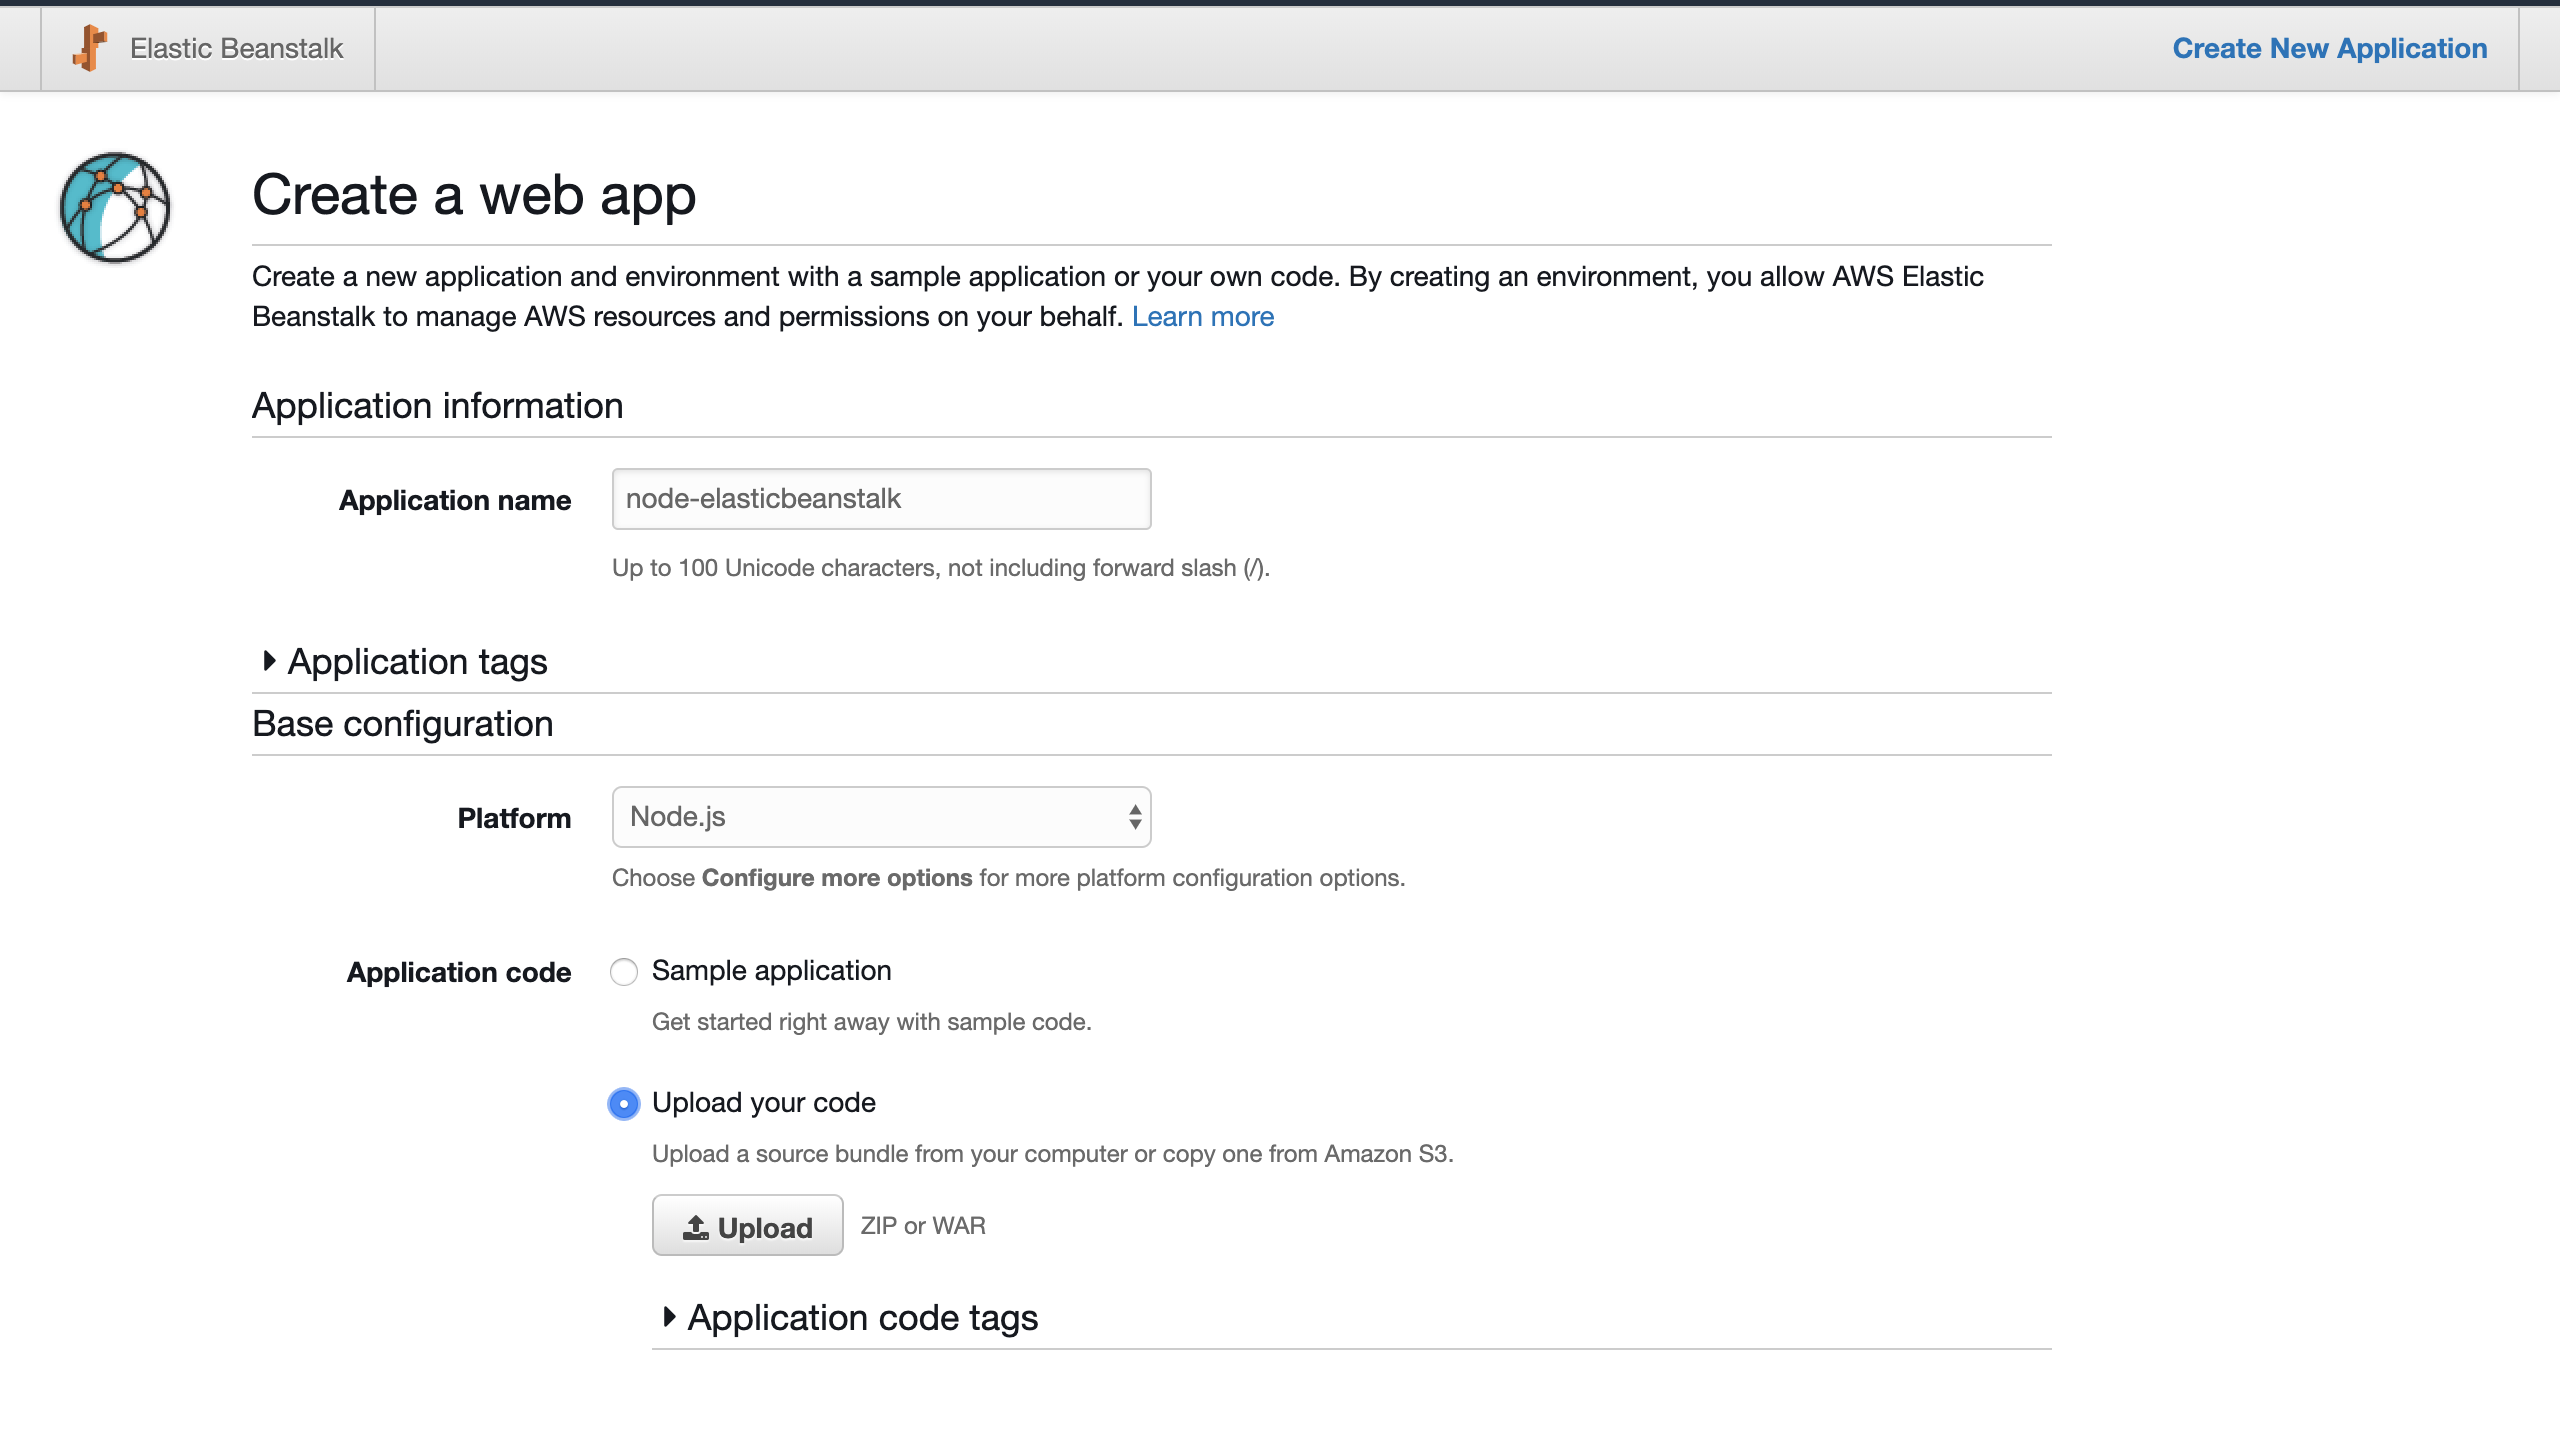 Elasticbeanstalk - Create a web app